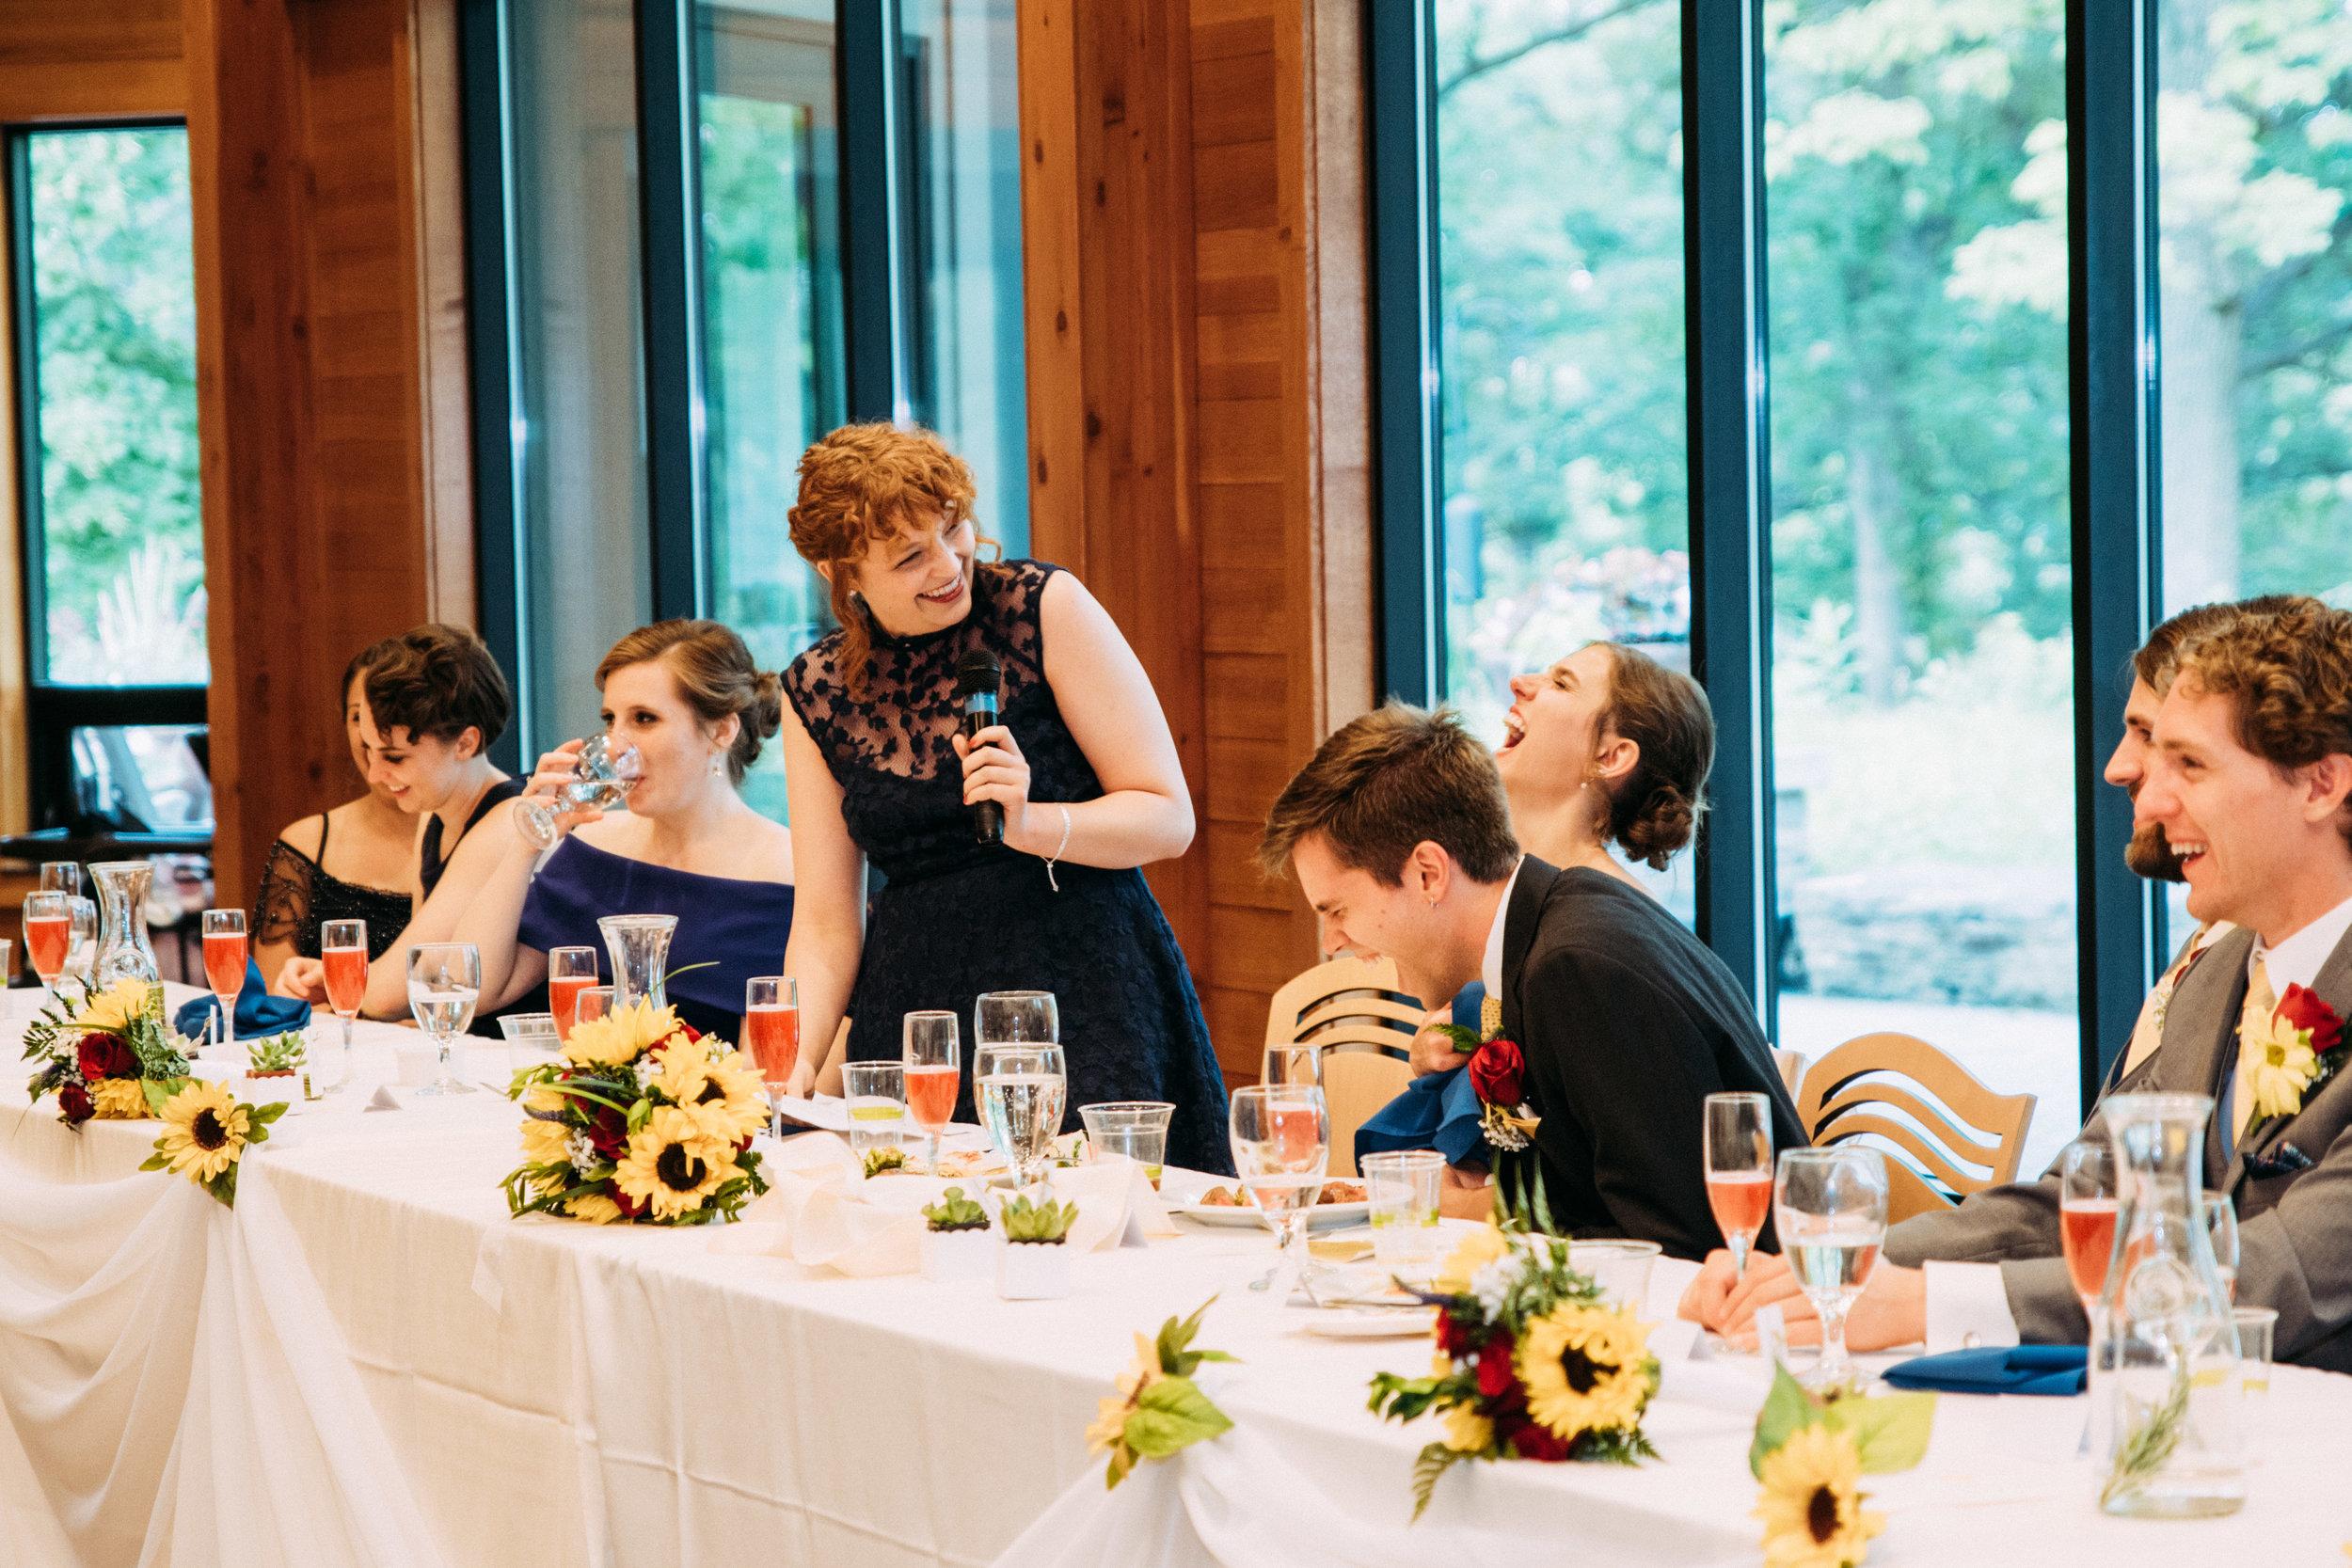 38-Liza_Chris_Minneapolis_Minnesota_Wedding.jpg